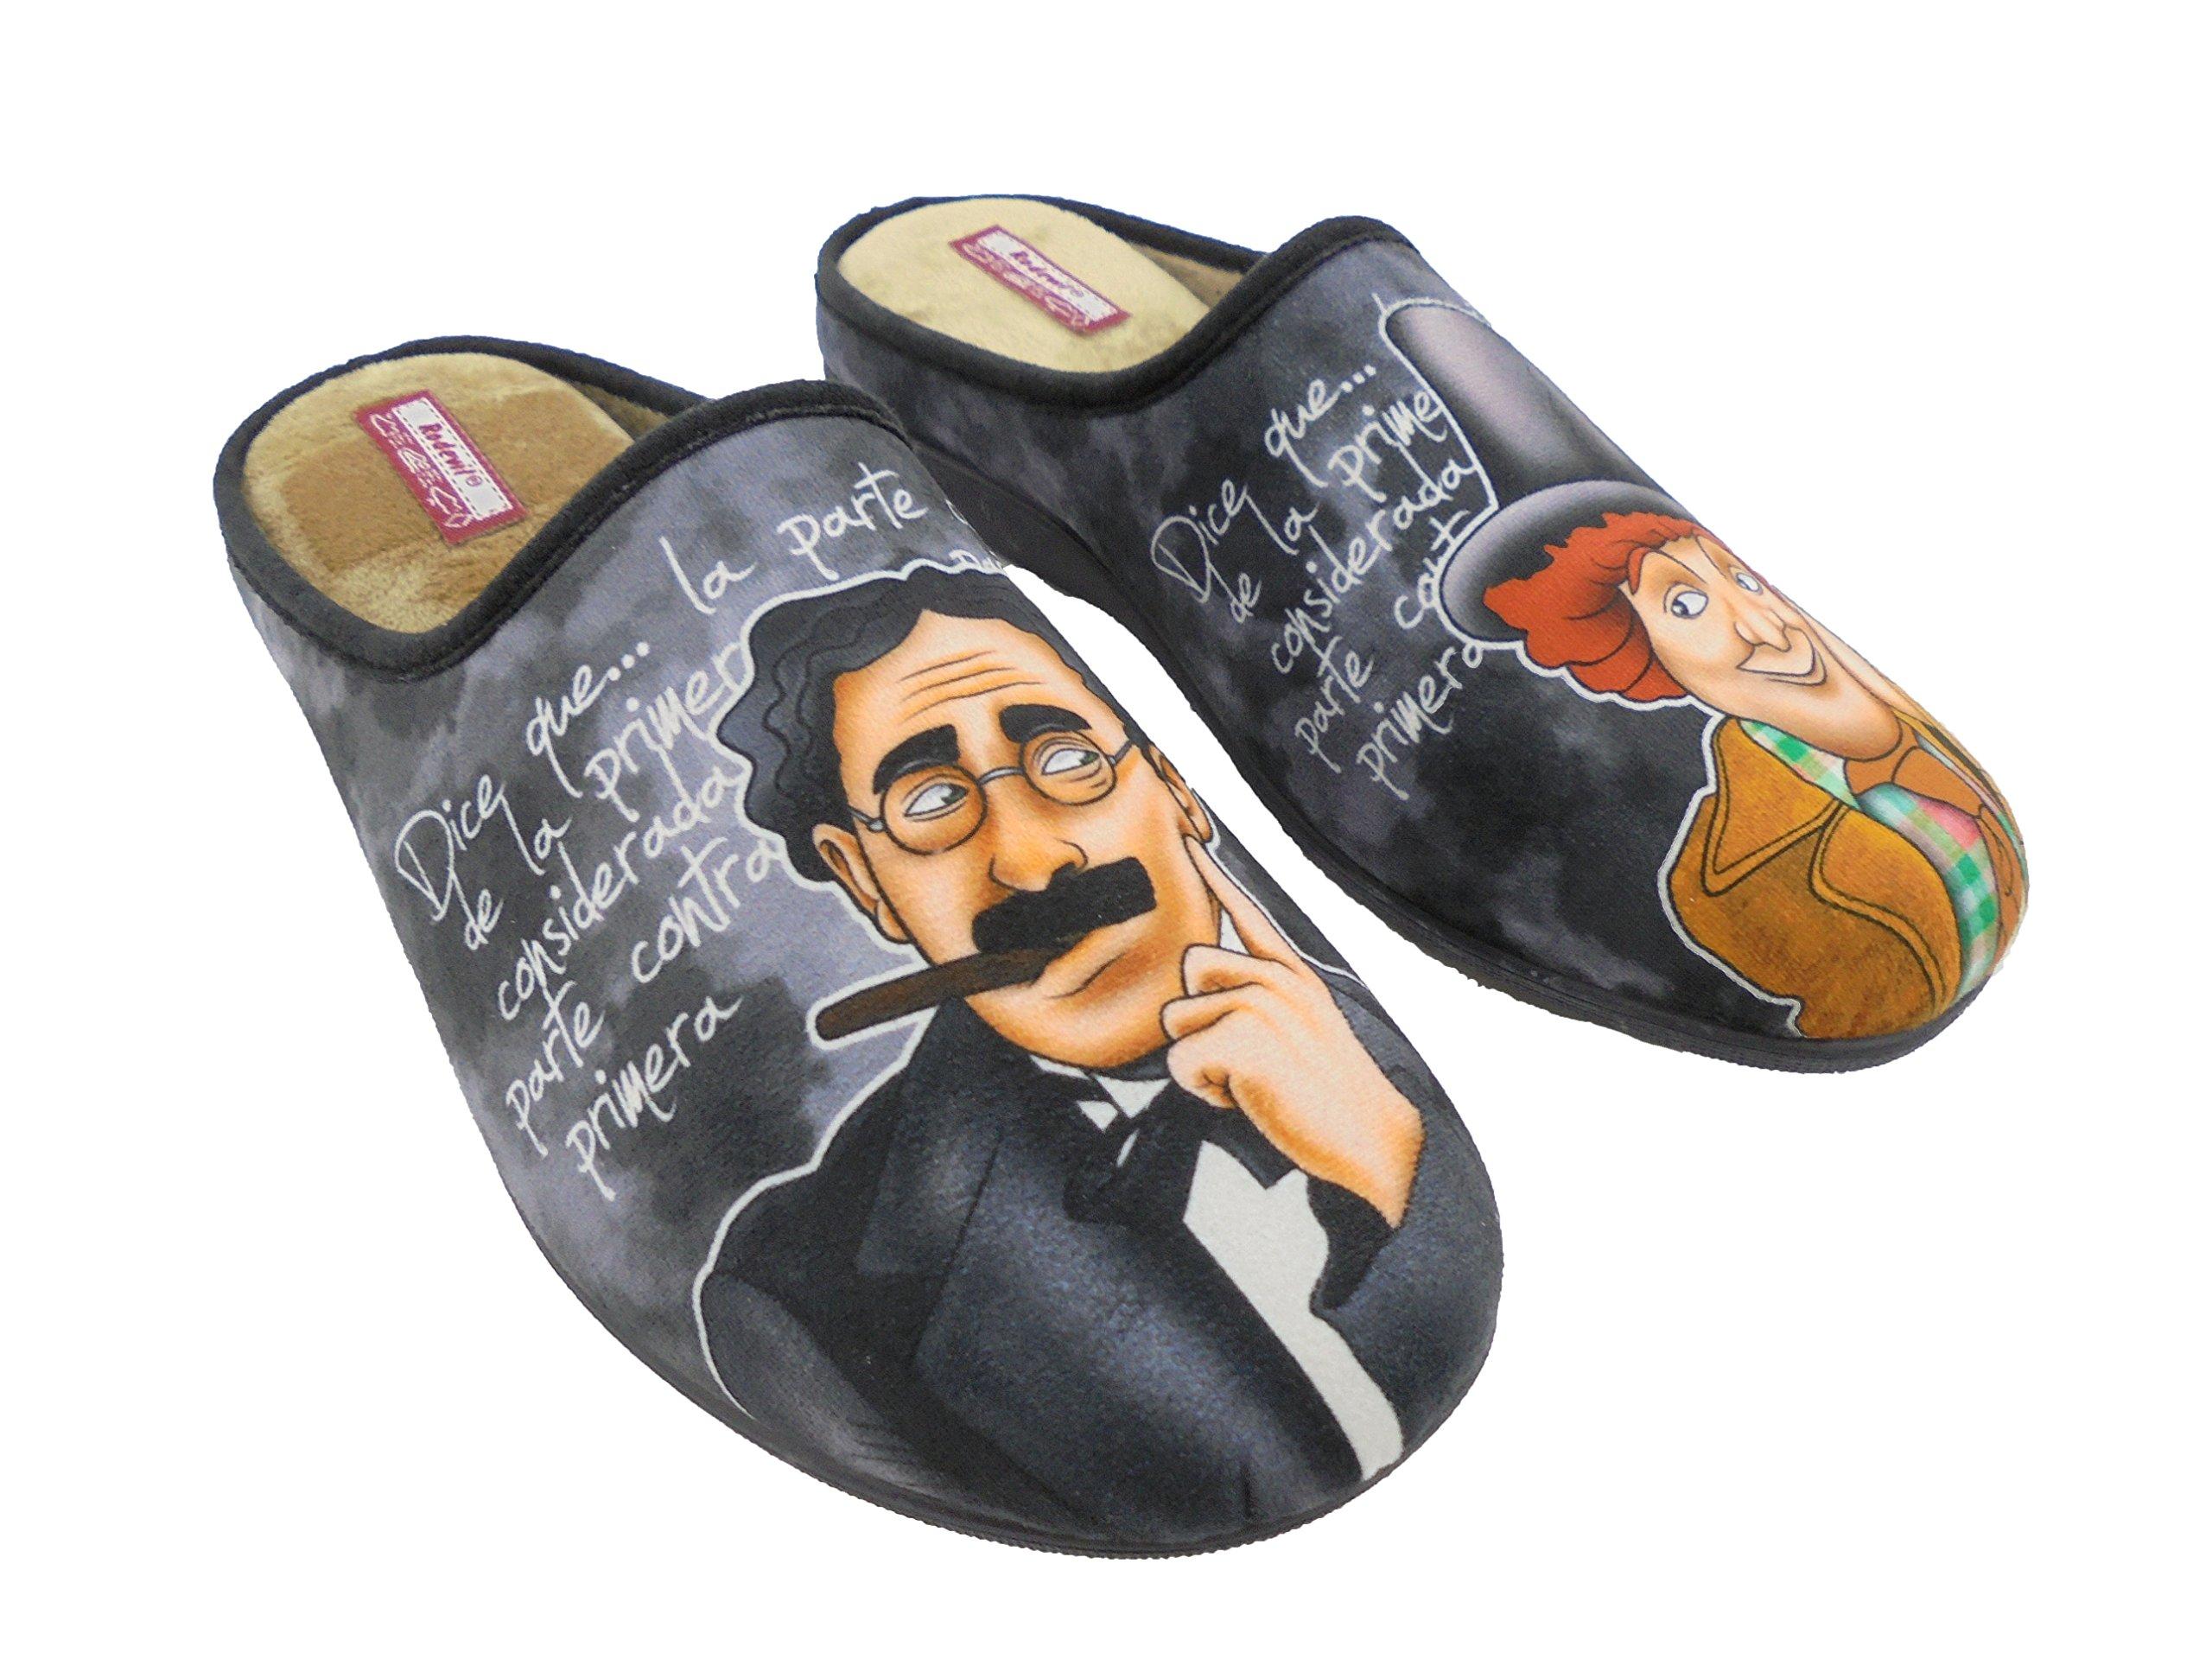 881961cd41a Zapatillas de Estar por Casa para Hombre Hermanos Marx Mod.529. Calzado  Made in Spain